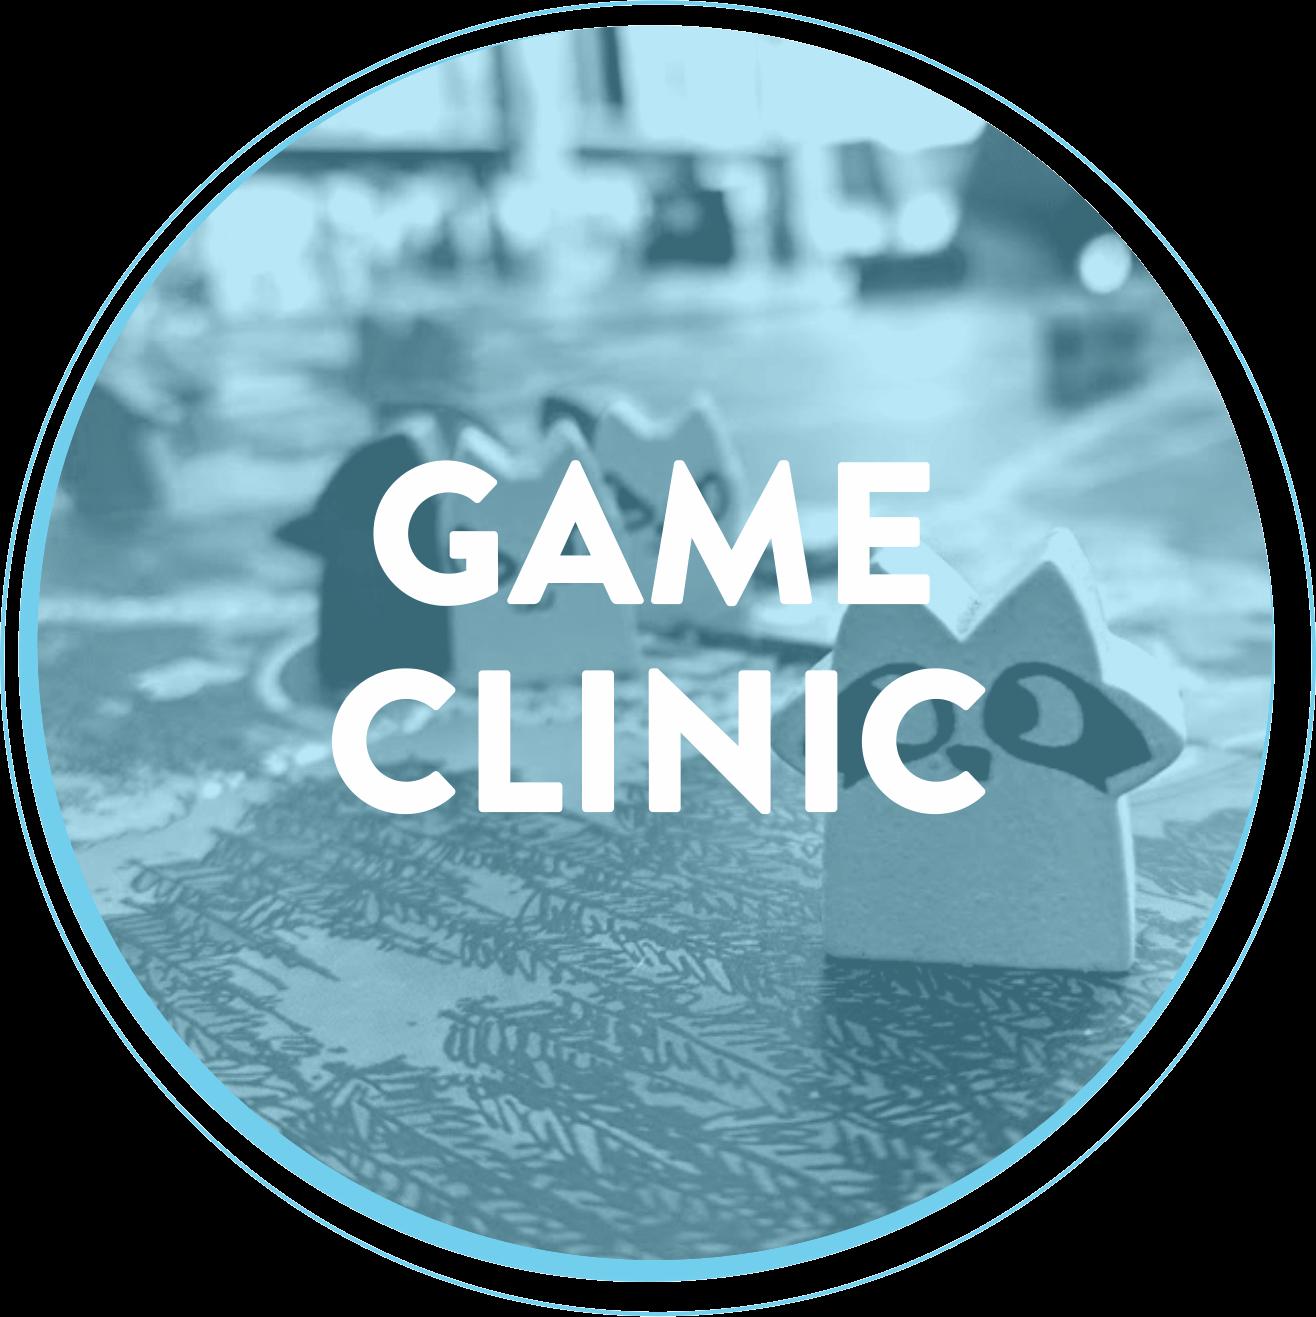 gamecliniccircle.png